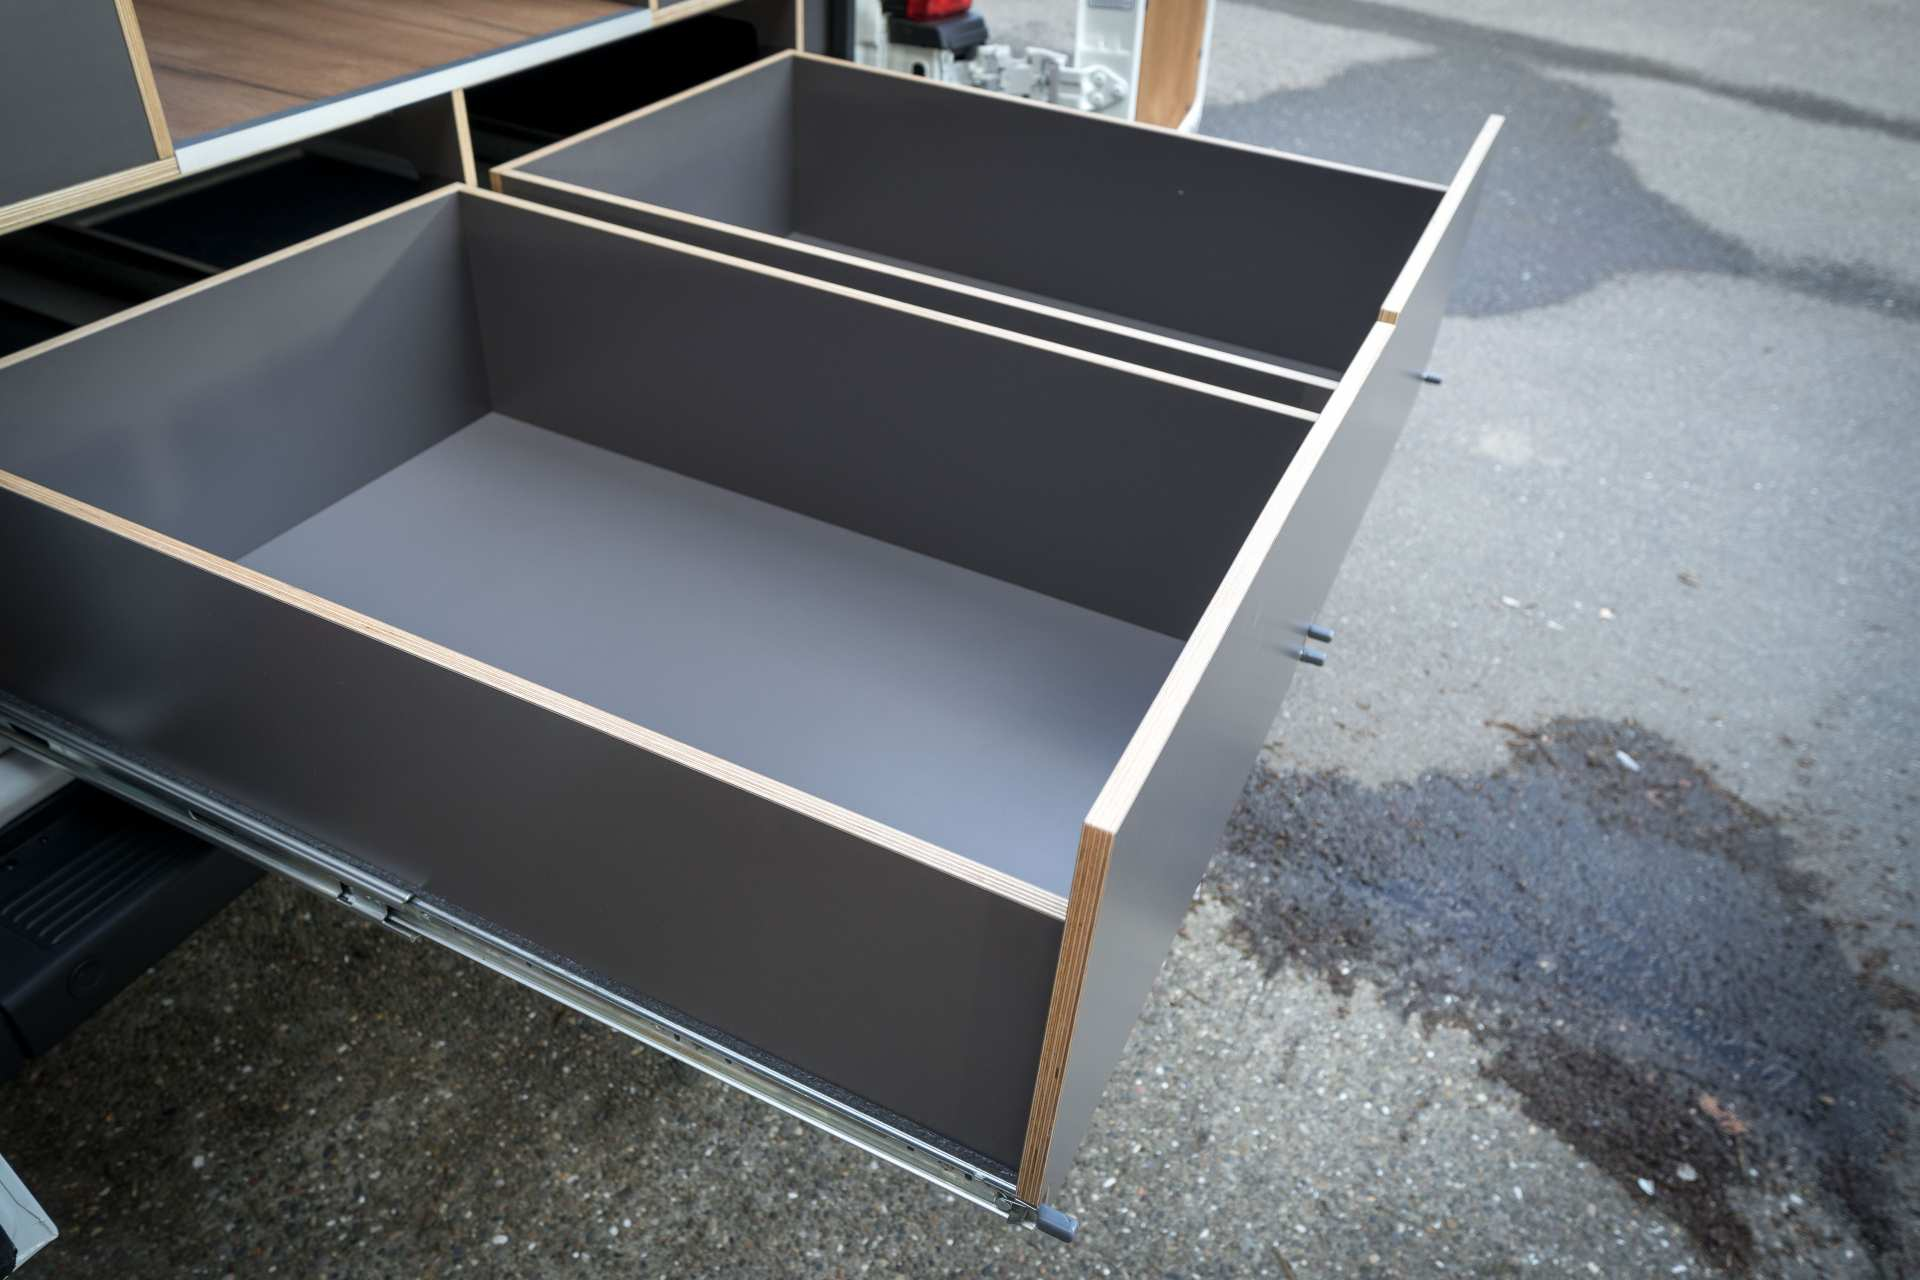 Individualausbau: Zwei-Raumwohnung Peugeot Boxer L2 H2 - 12